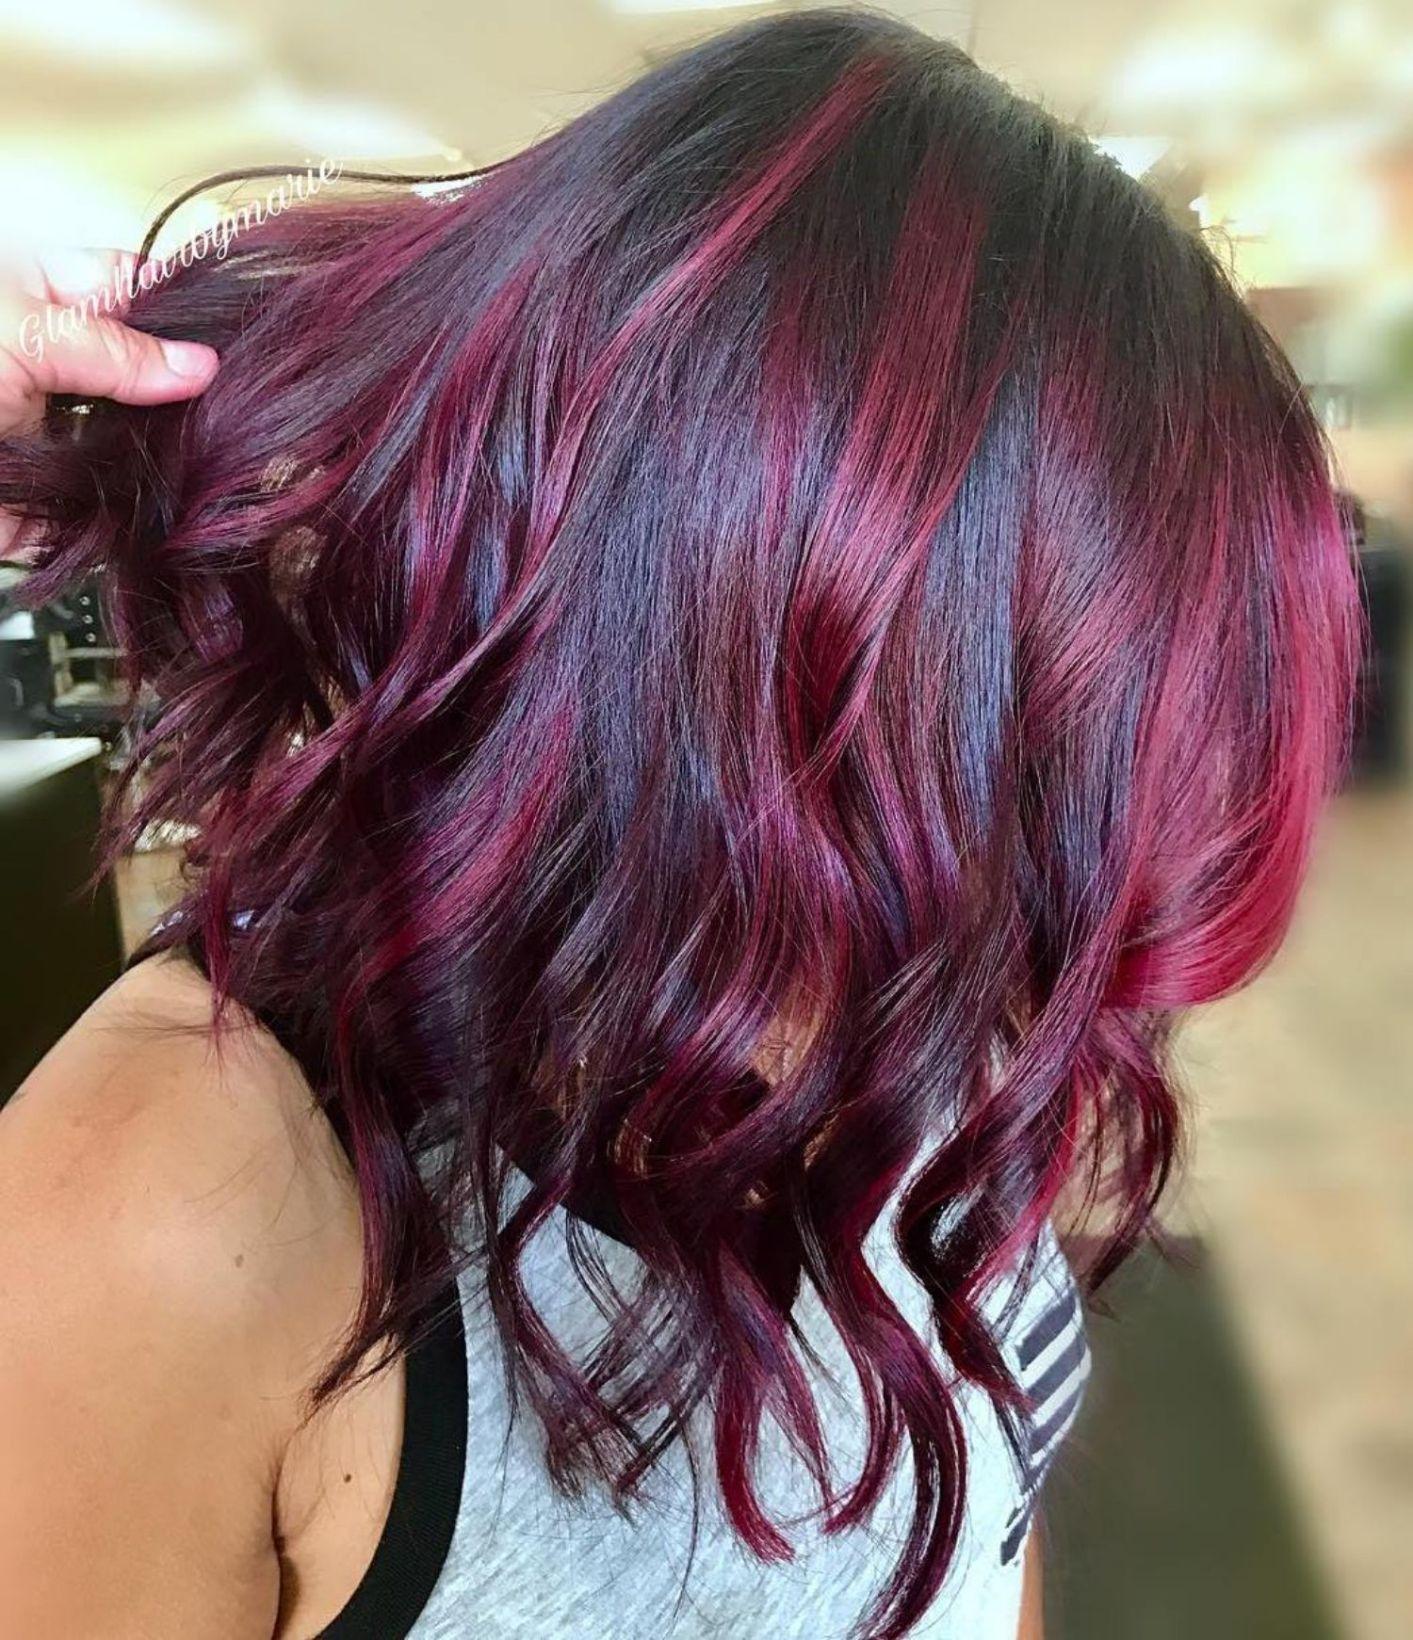 Black Lob With Bright Burgundy Highlights Haircolorred Magenta Hair Hair Highlights Hair Color Burgundy